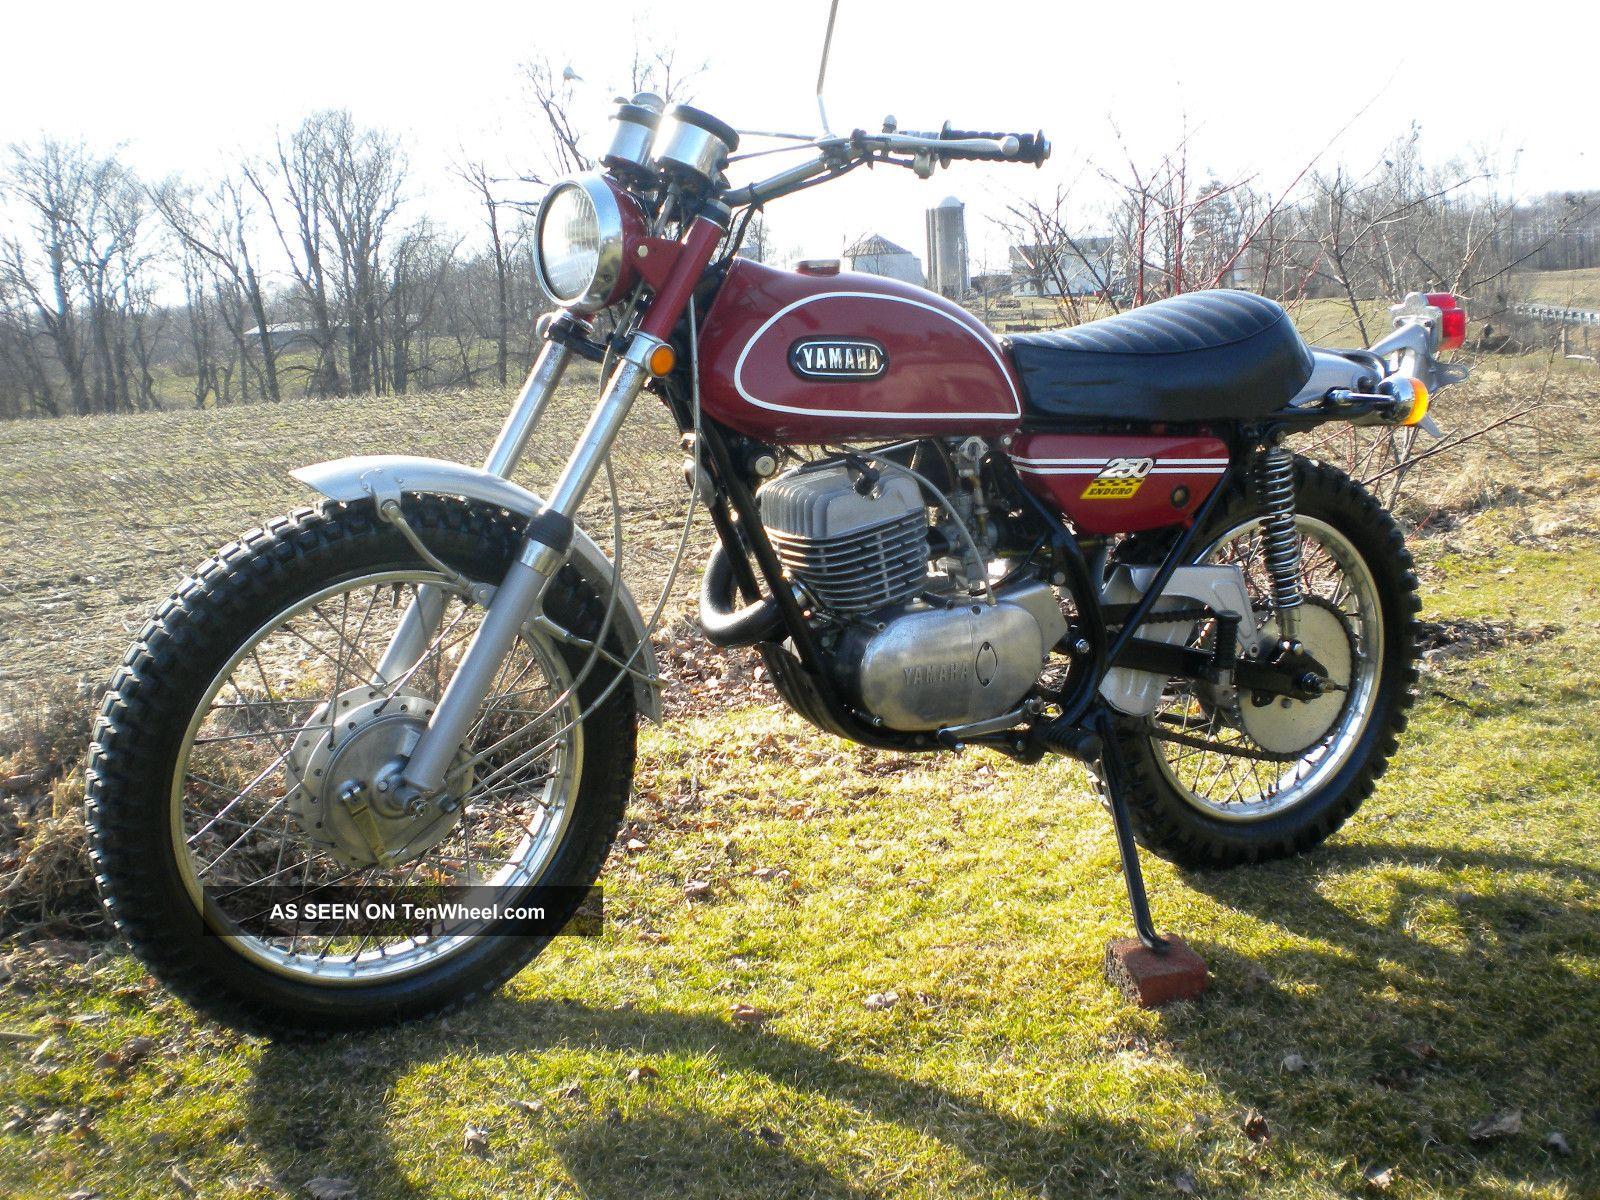 1970 Yamaha Dt 250 1972 175 Wiring Diagram 2001 Bayliner Capri